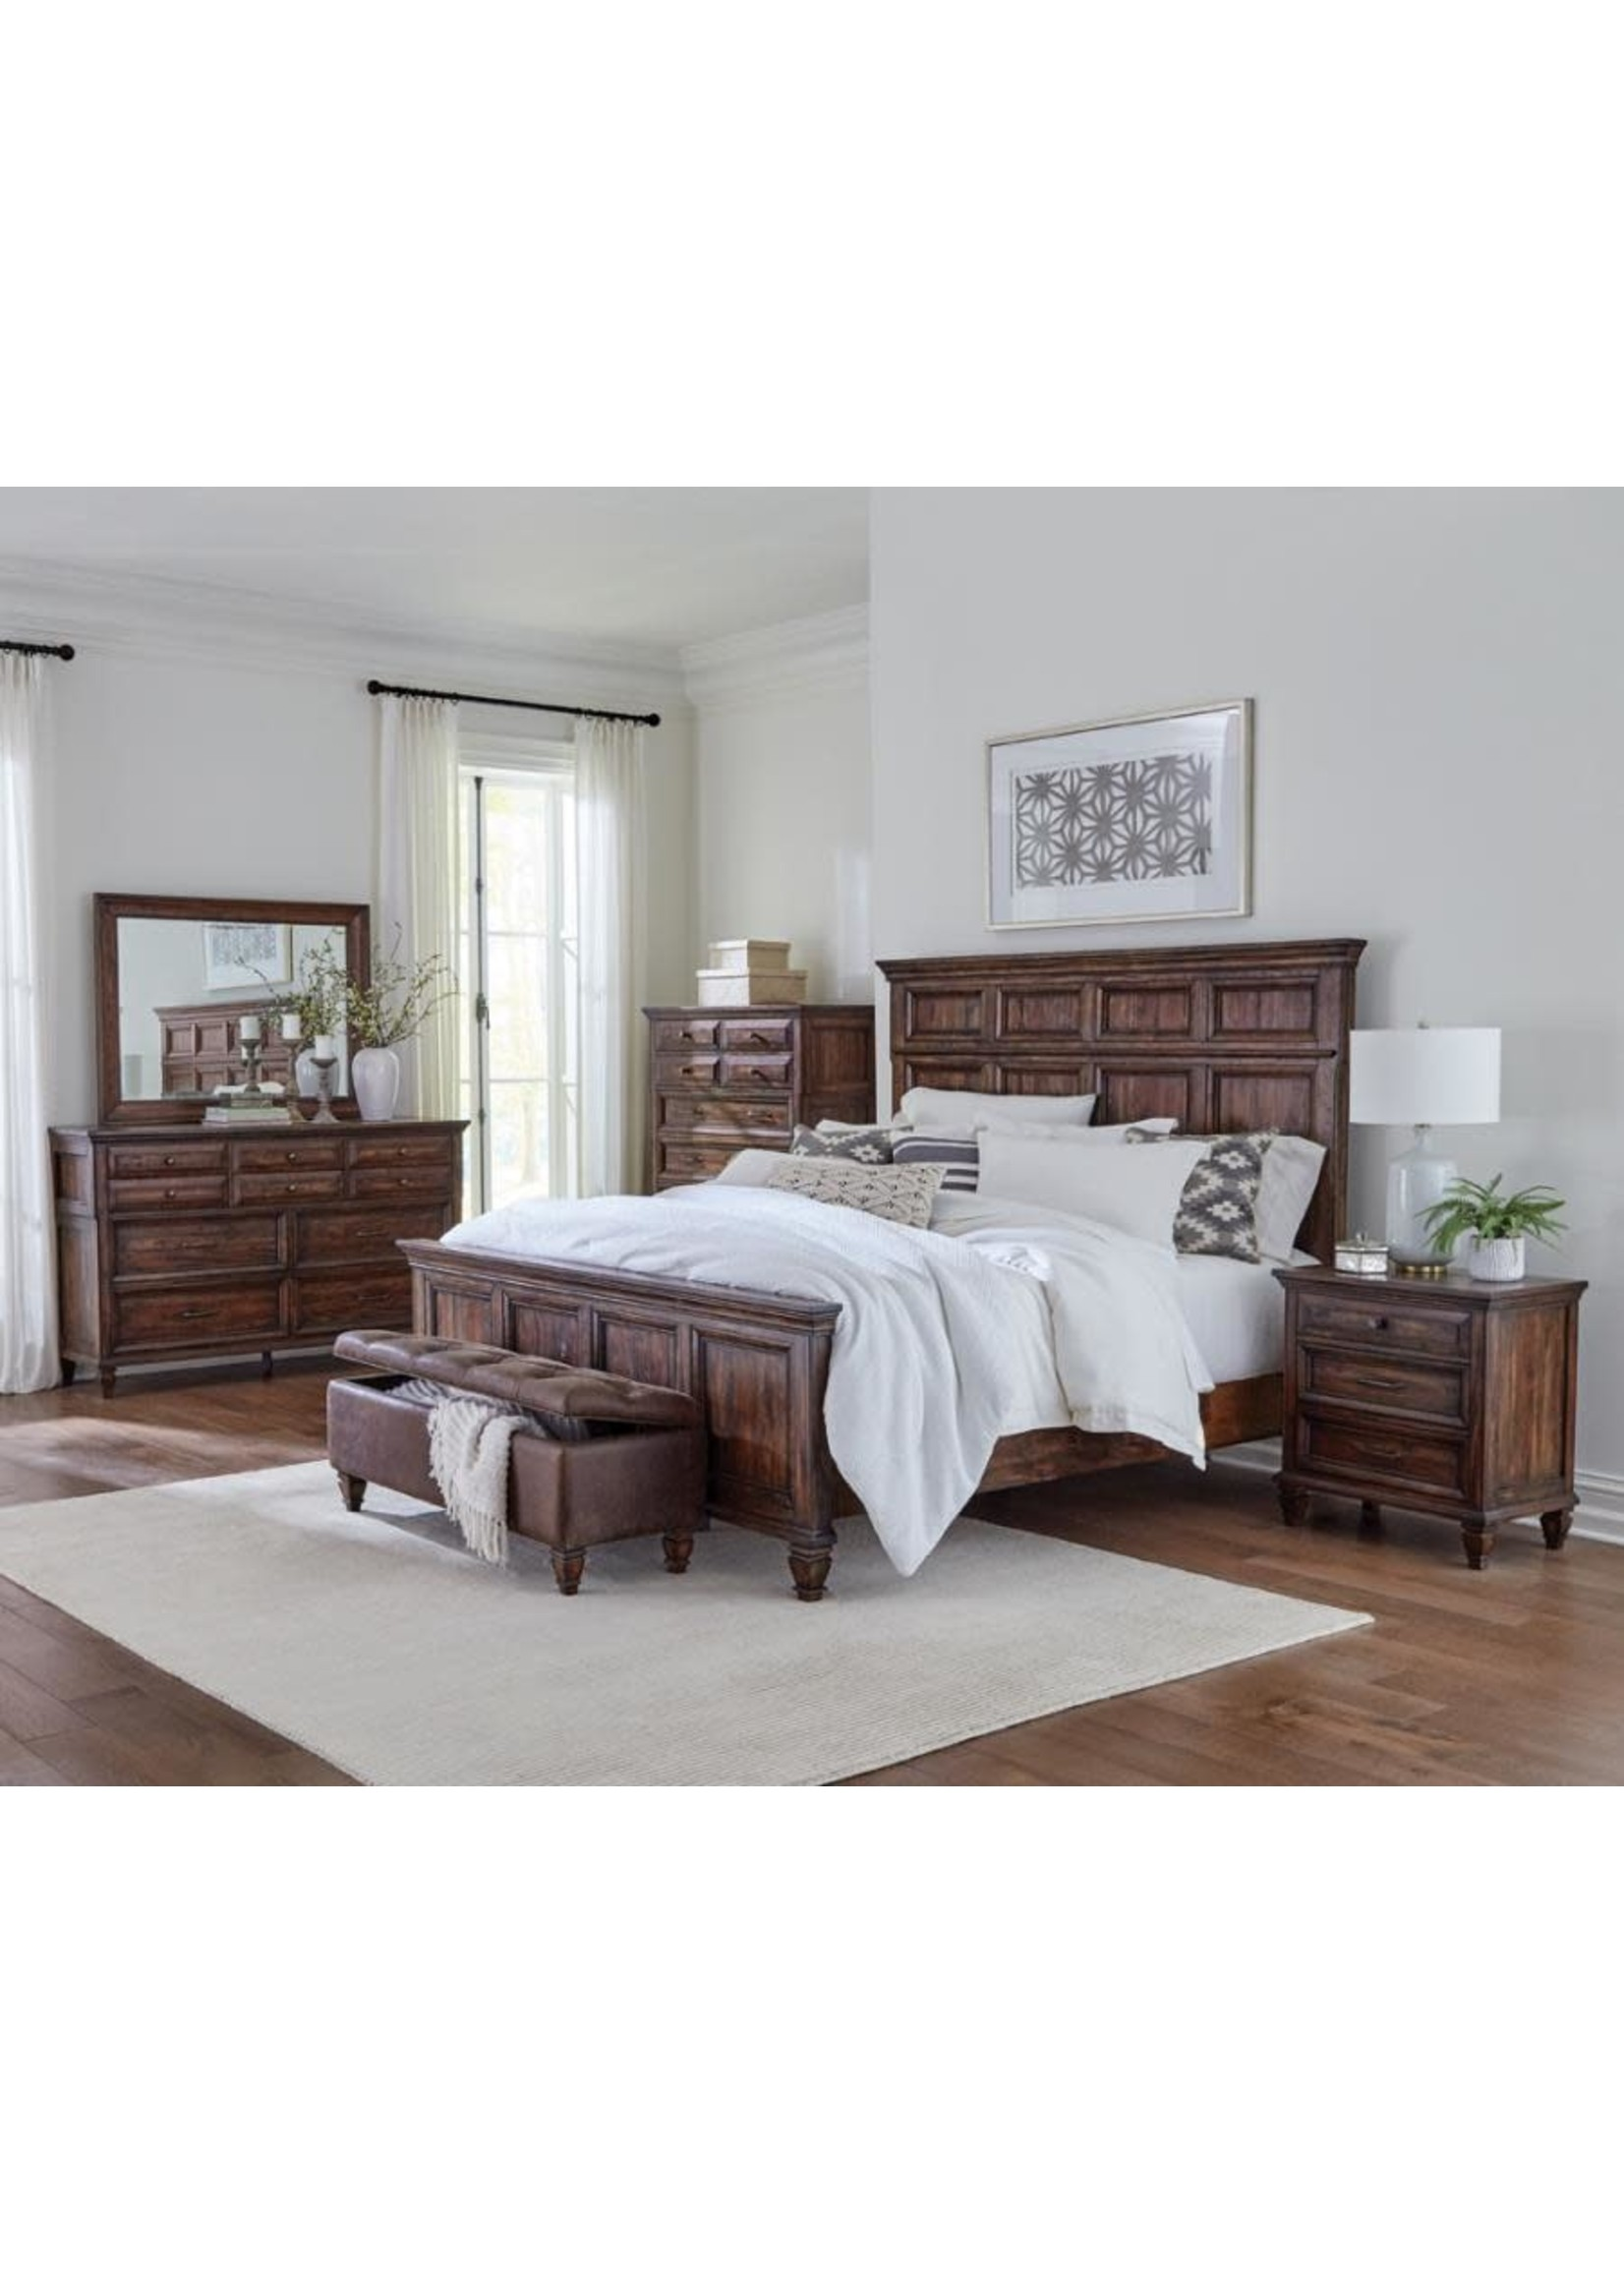 Coaster Furniture COASTER King 4pc Bedroom Set